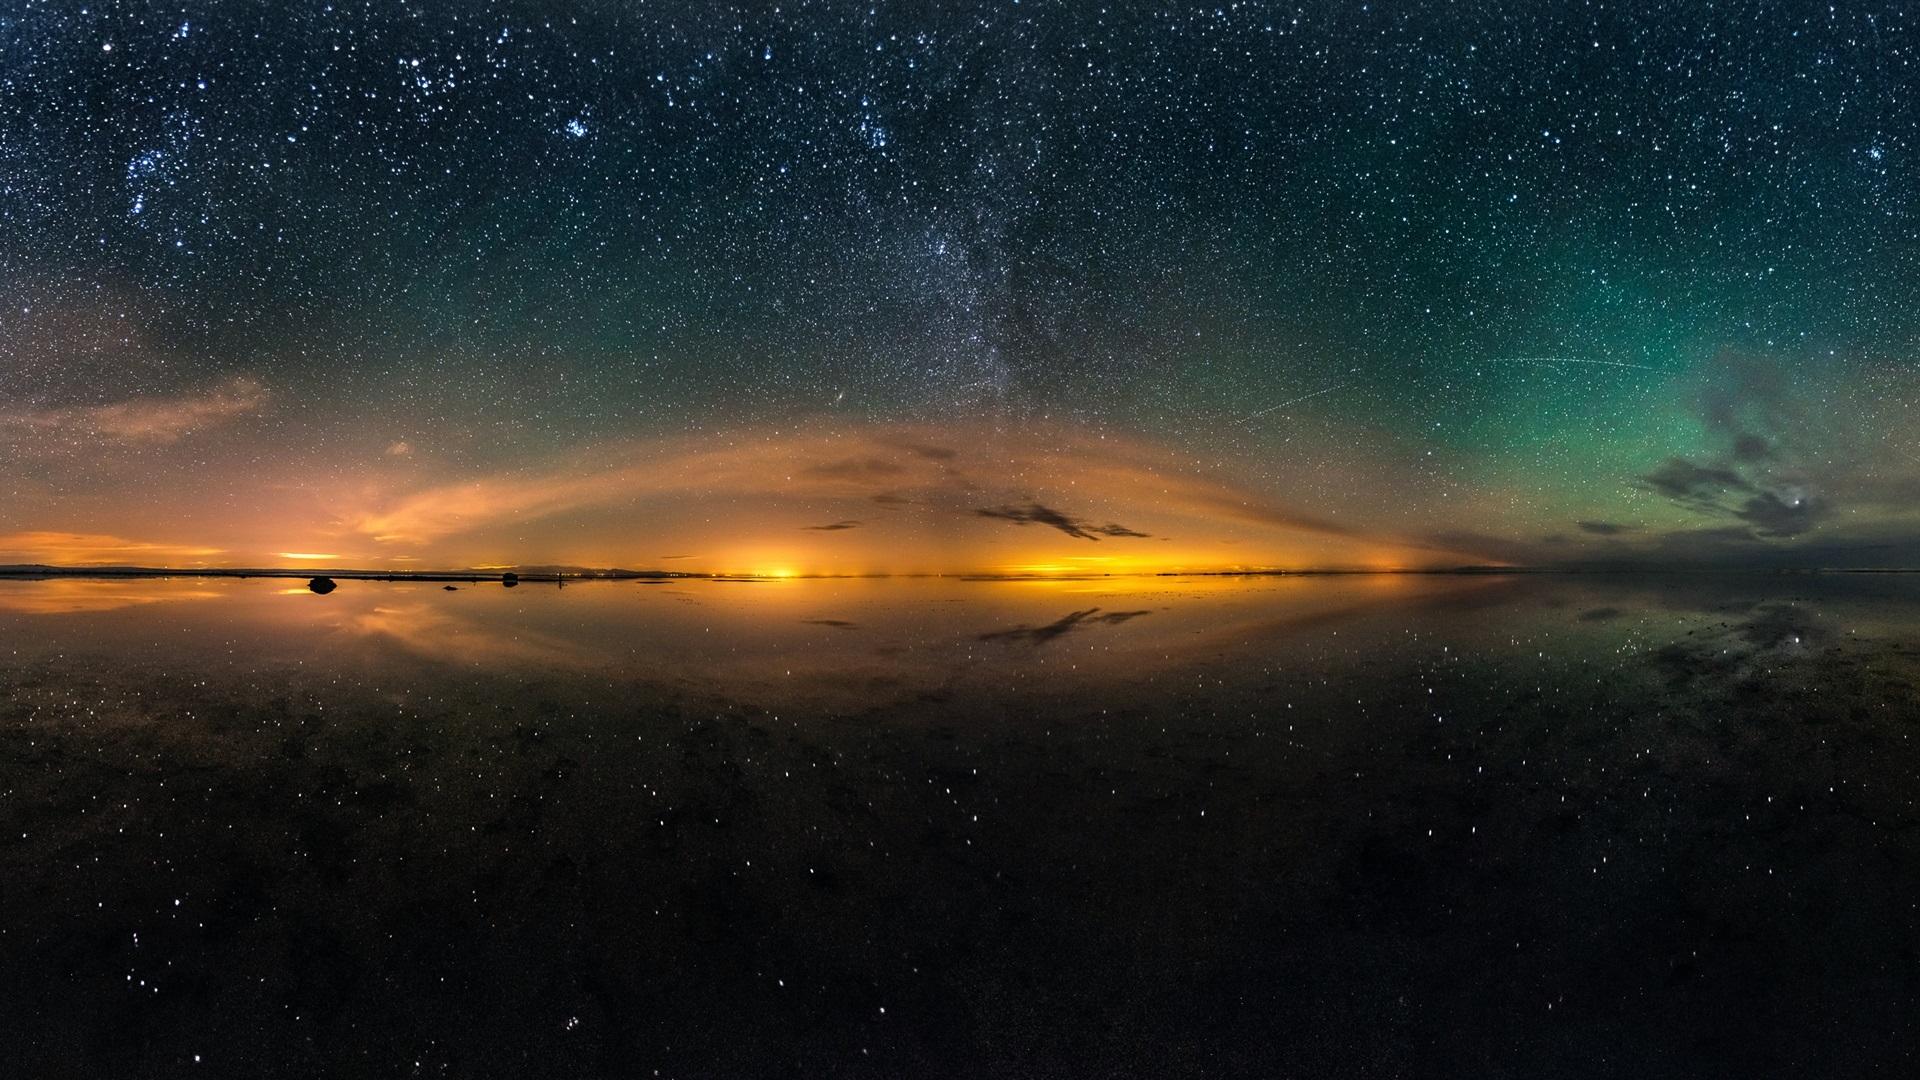 Wallpaper Salt Lake Beautiful Night Sky Stars Water Reflection